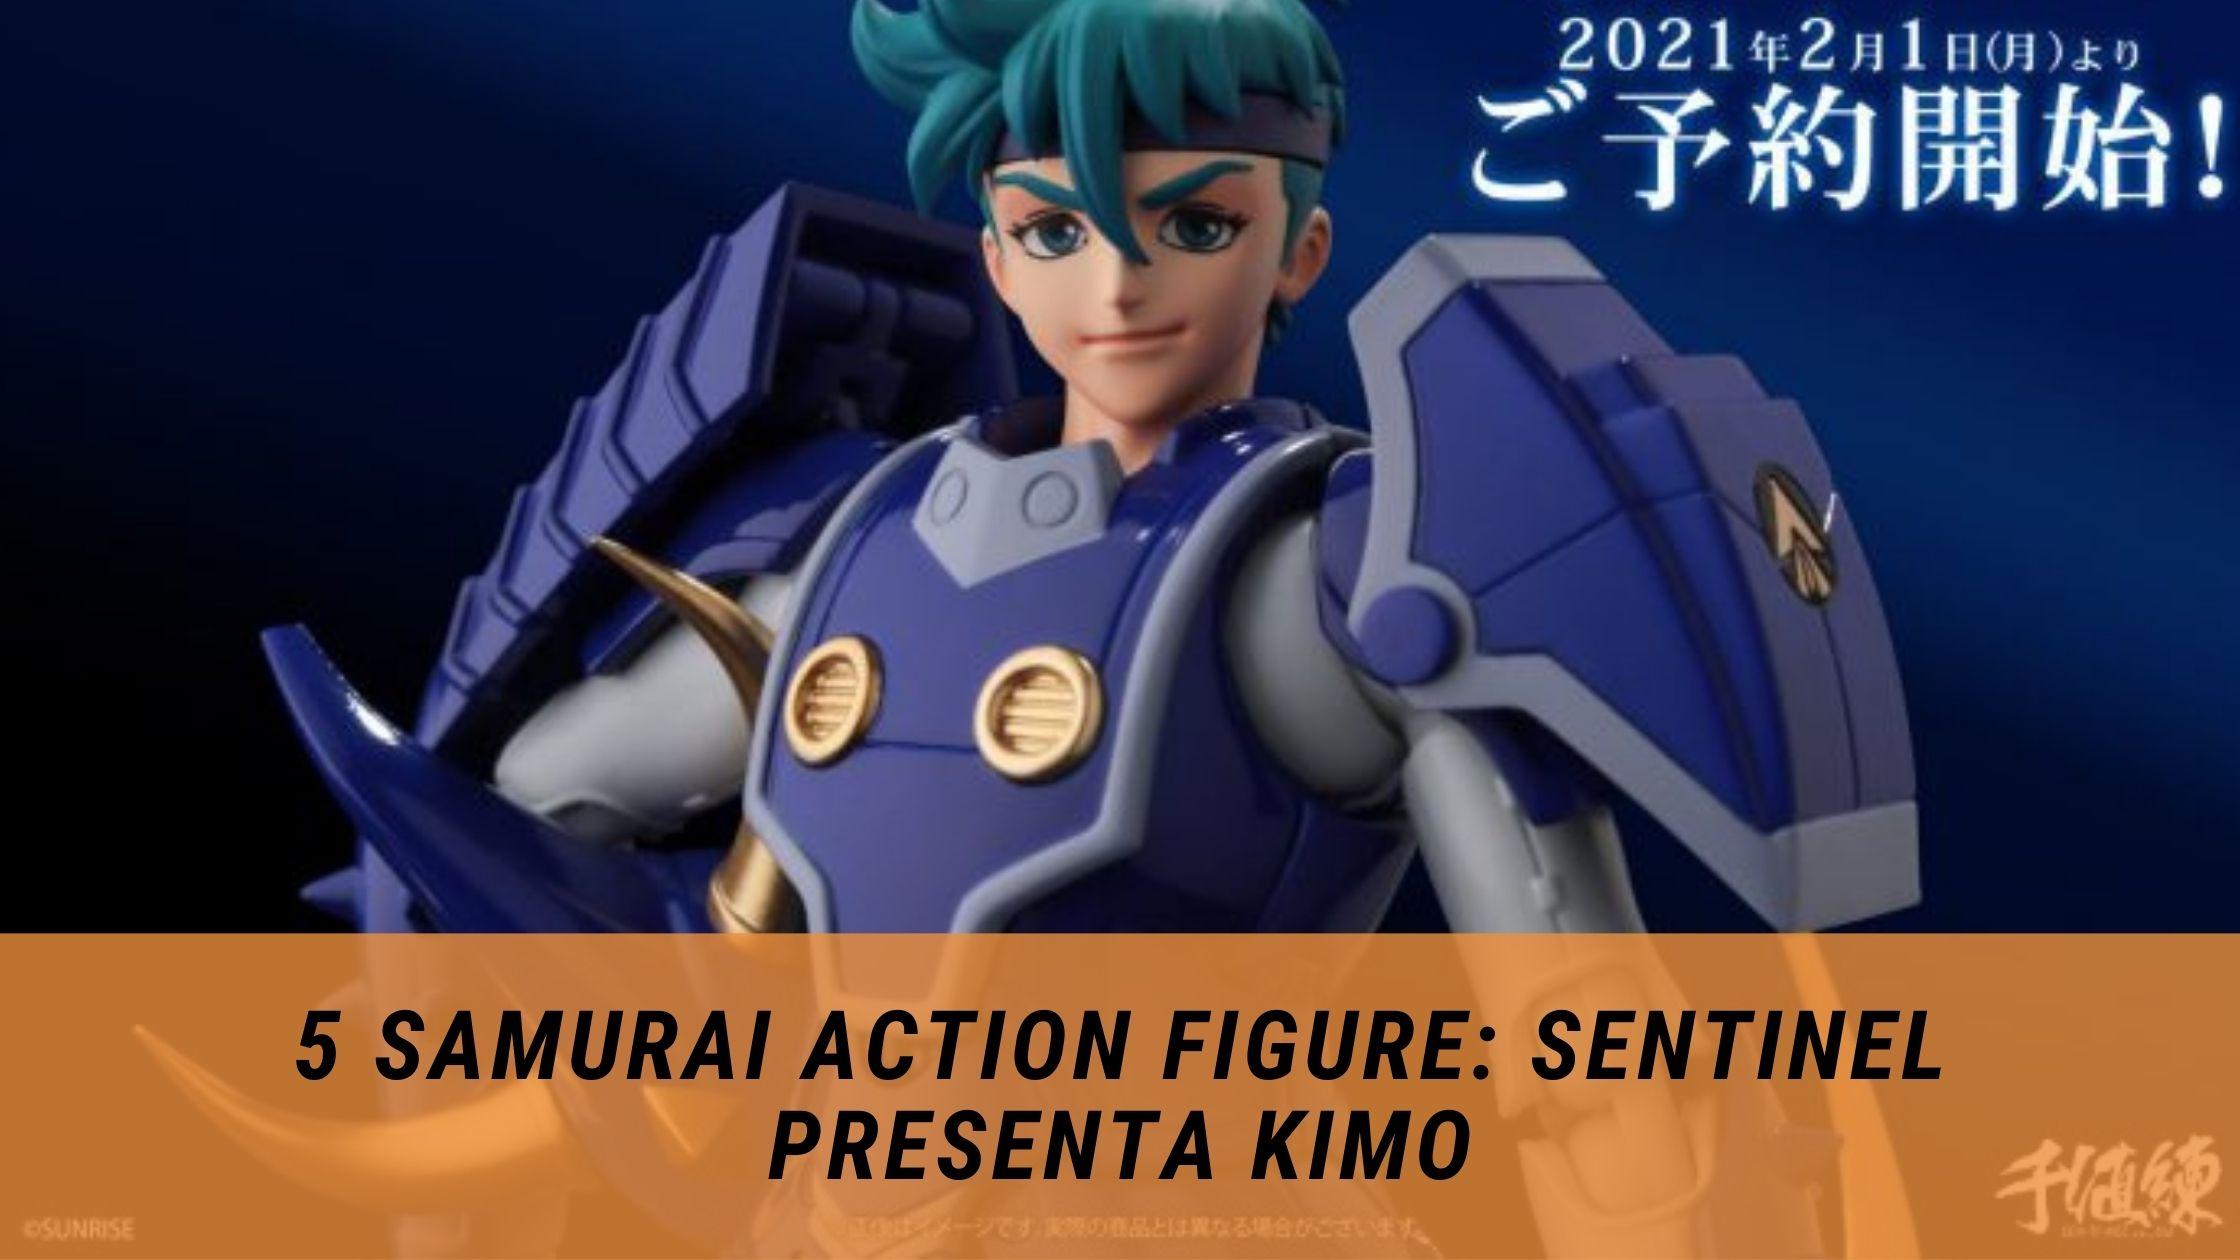 5 samurai action figure kimo